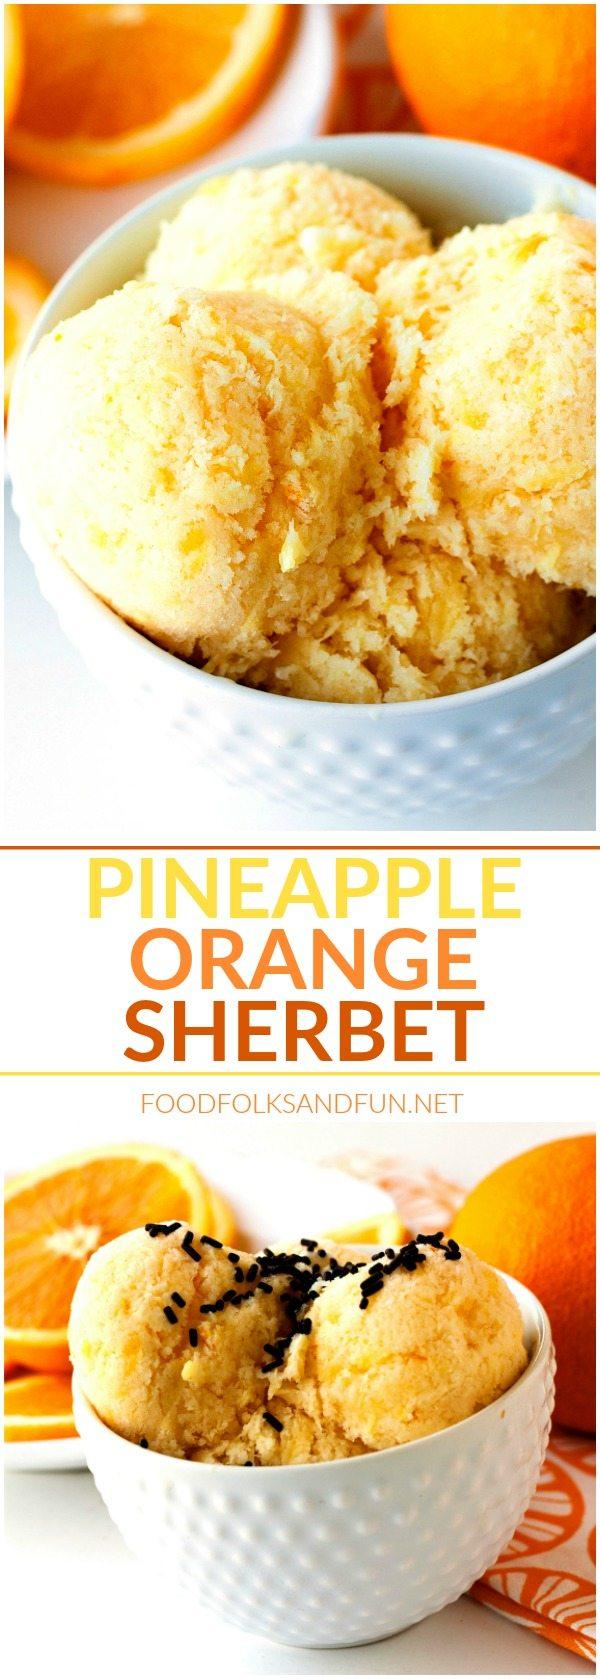 Picture collage of orange sherbet.